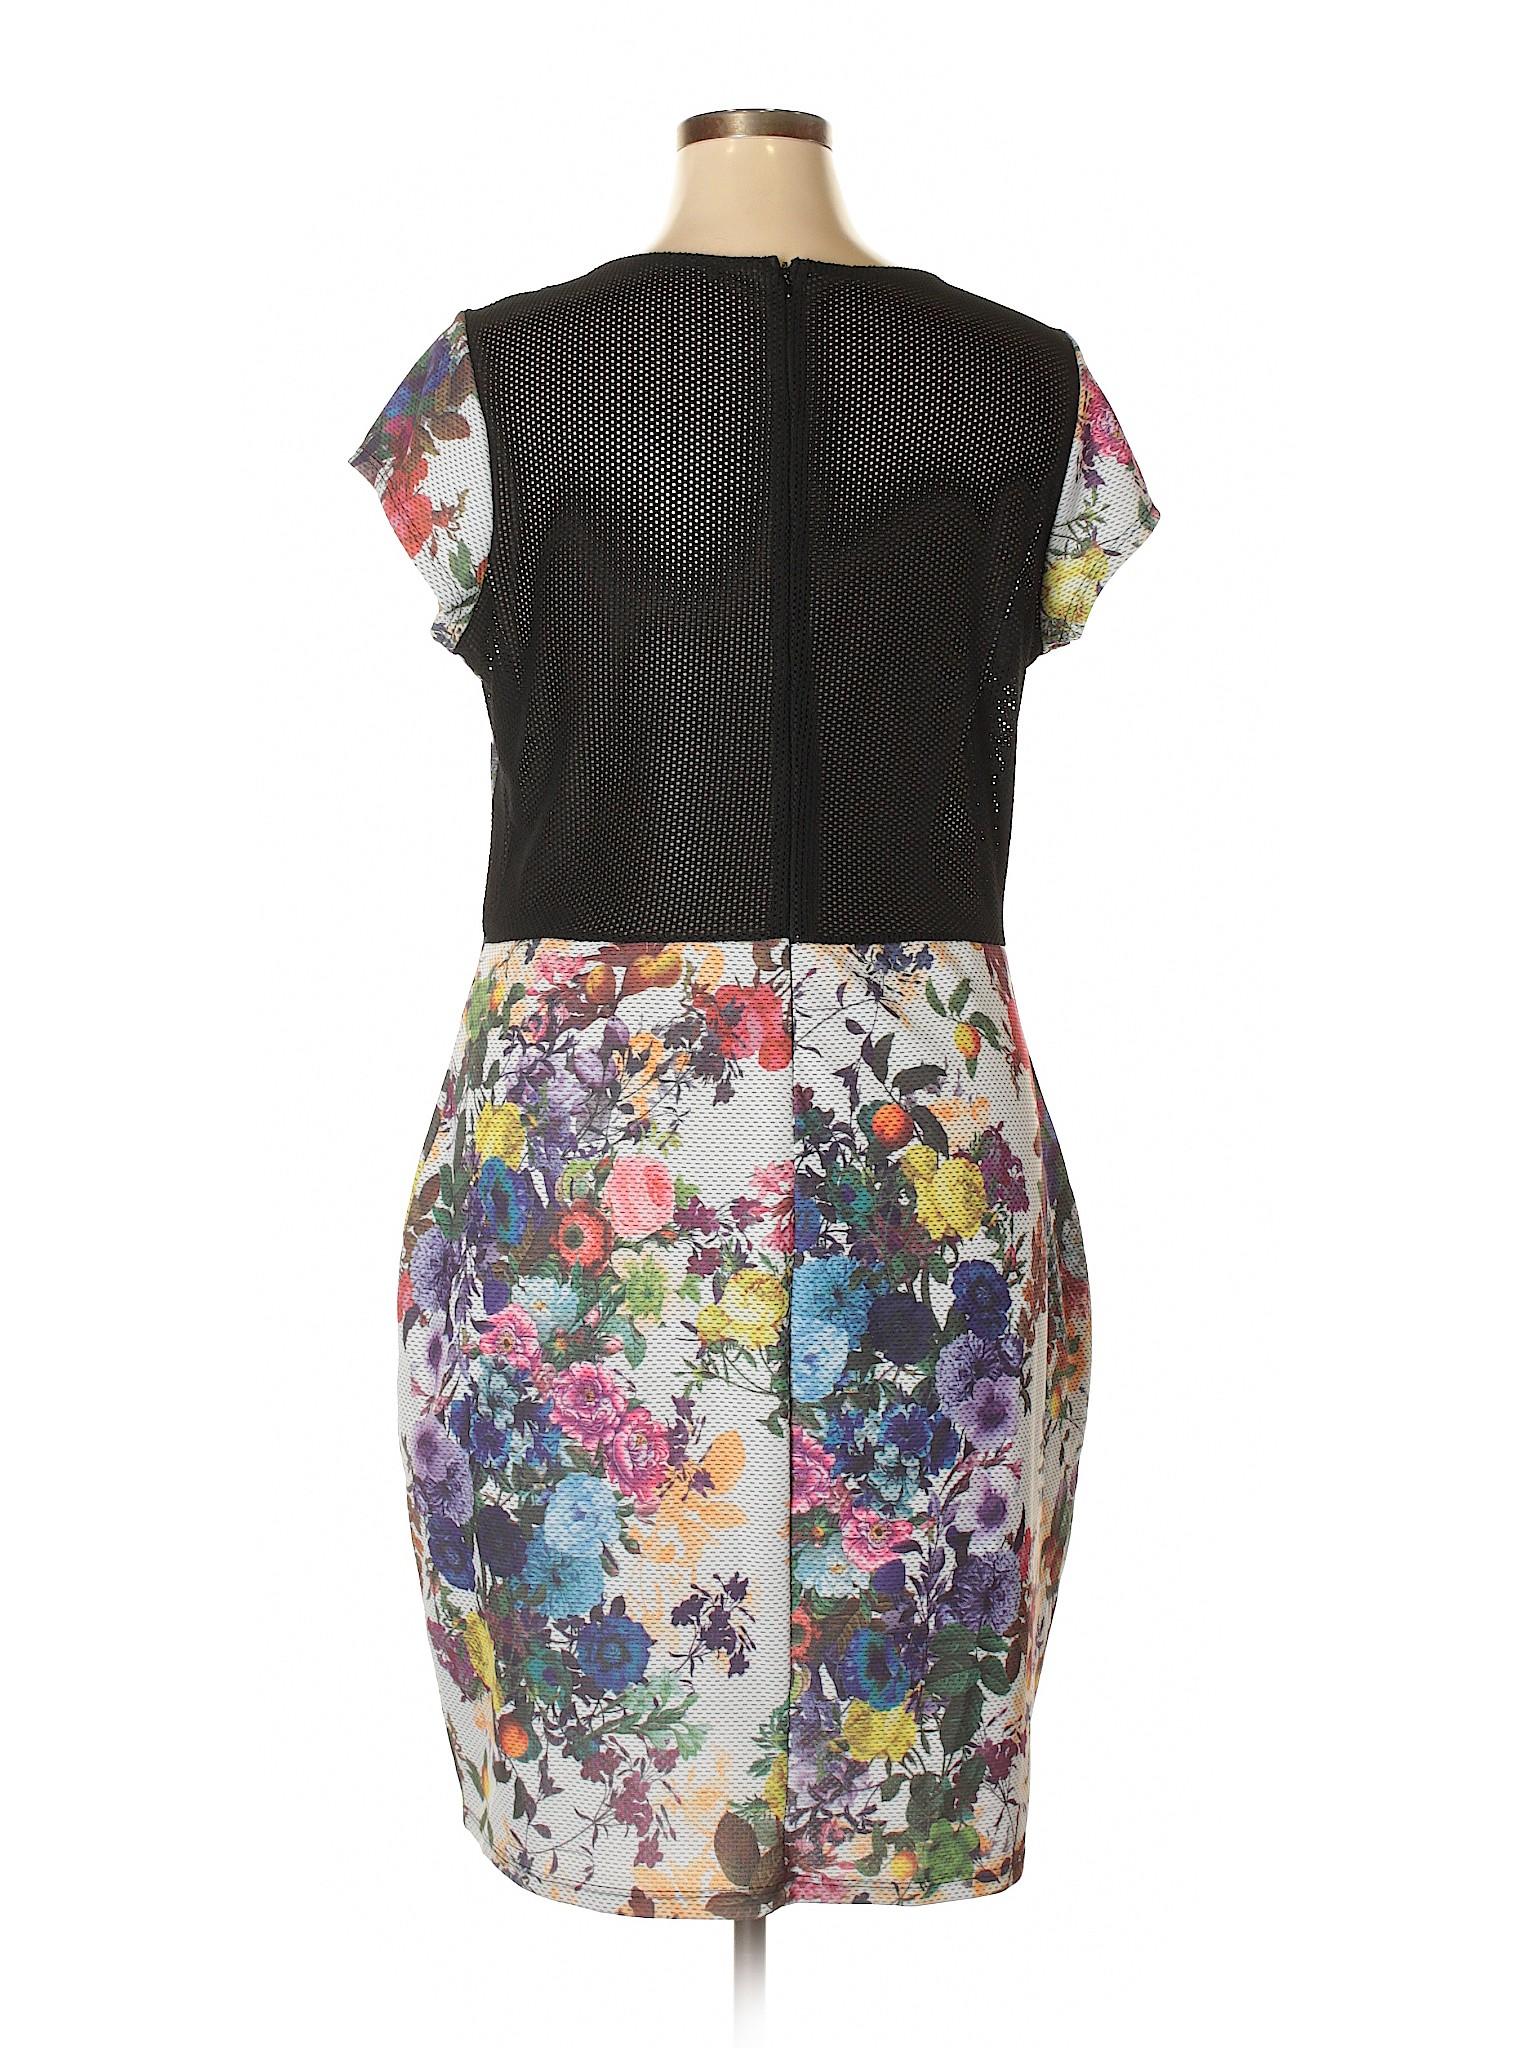 Casual FASHION Dress winter TO FIGURE Boutique xAHw0qa6Ia